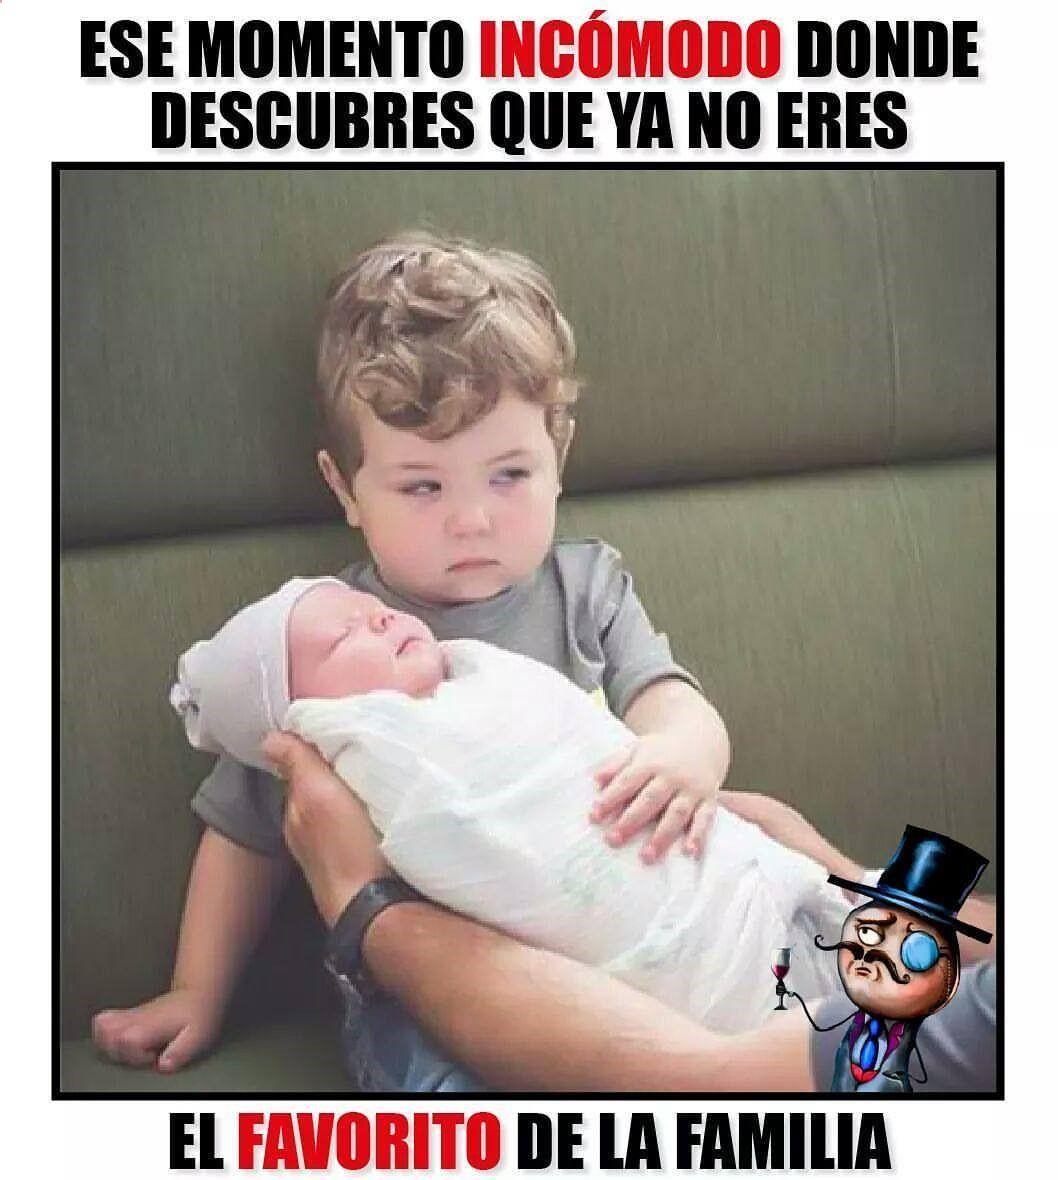 Imagenes De Humor Memes Chistes Chistesmalos Imagenesgraciosas Humor Www Megamemeces C Http Www Dive Baby Memes Funny Memes Funny Spanish Memes